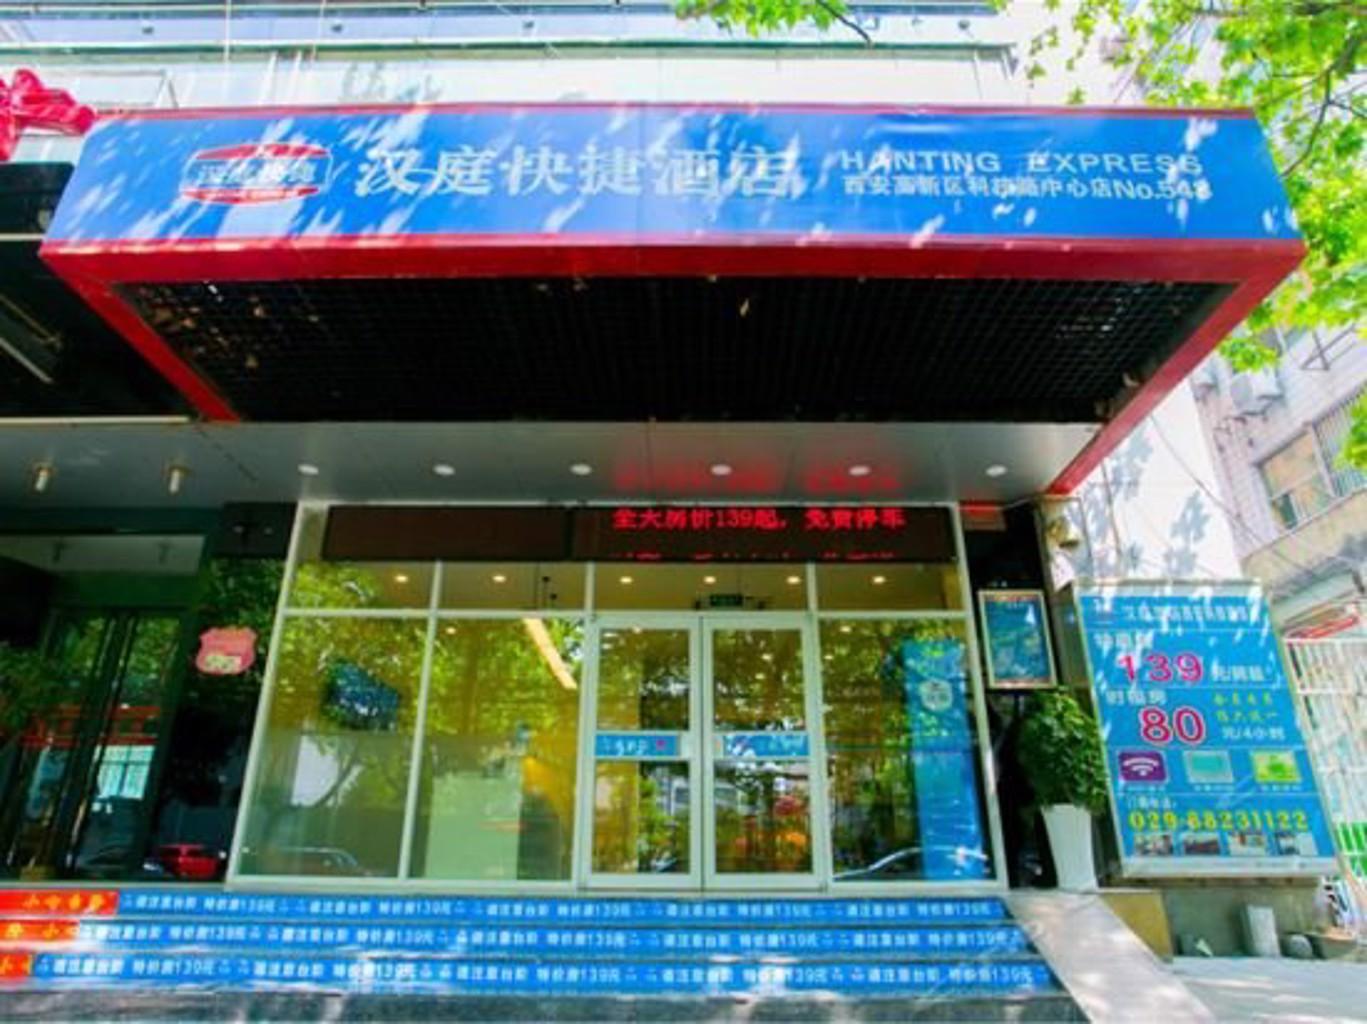 Hanting Express Keji Road Xi'an